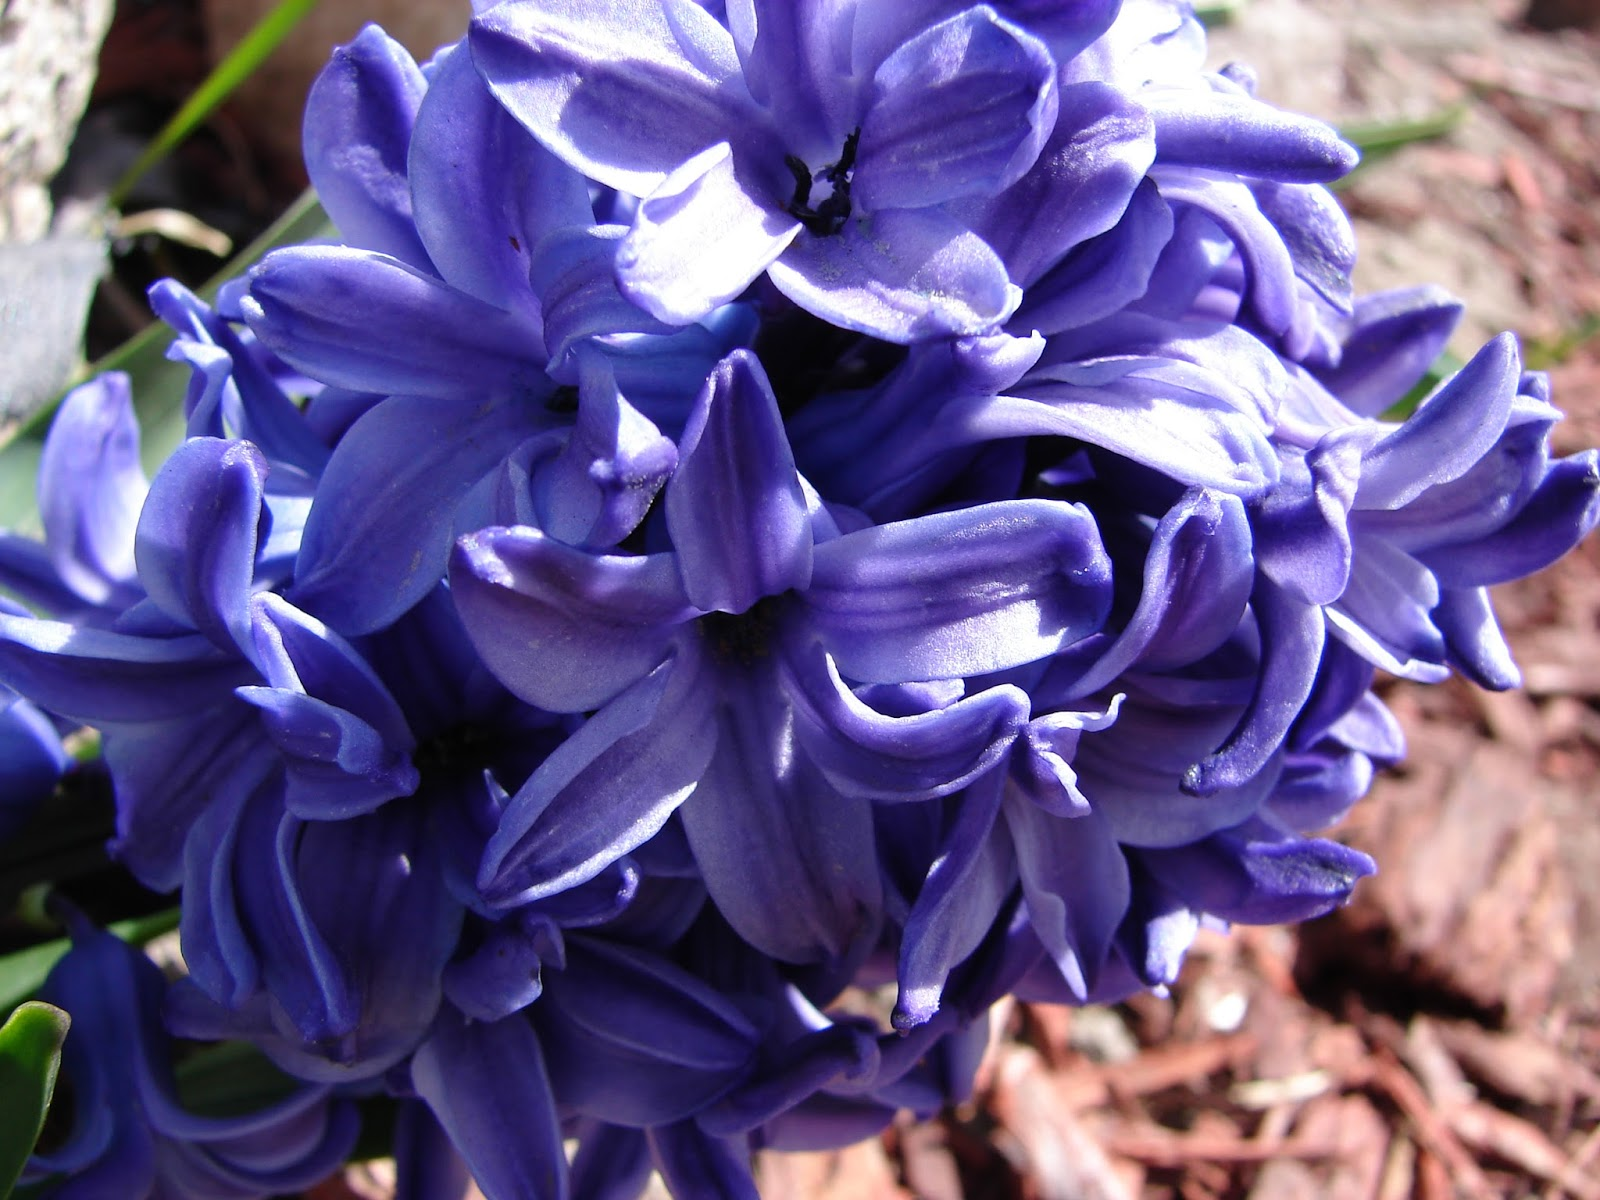 New Utah Gardener: Hyacinths To Feed Your Soul!